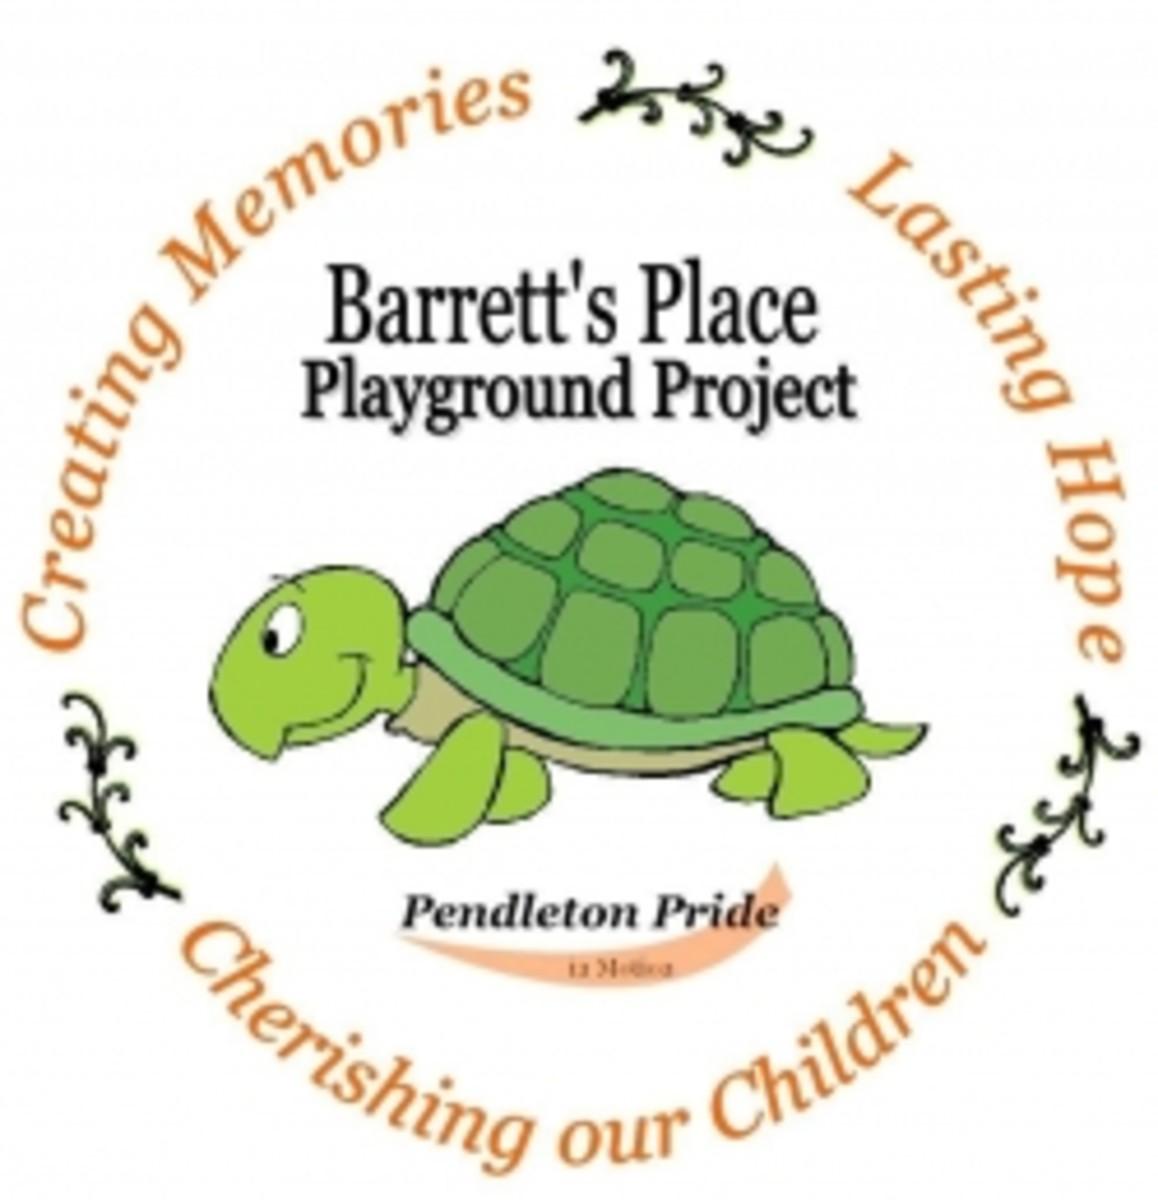 Barrett's Place Playground in Pendleton SC